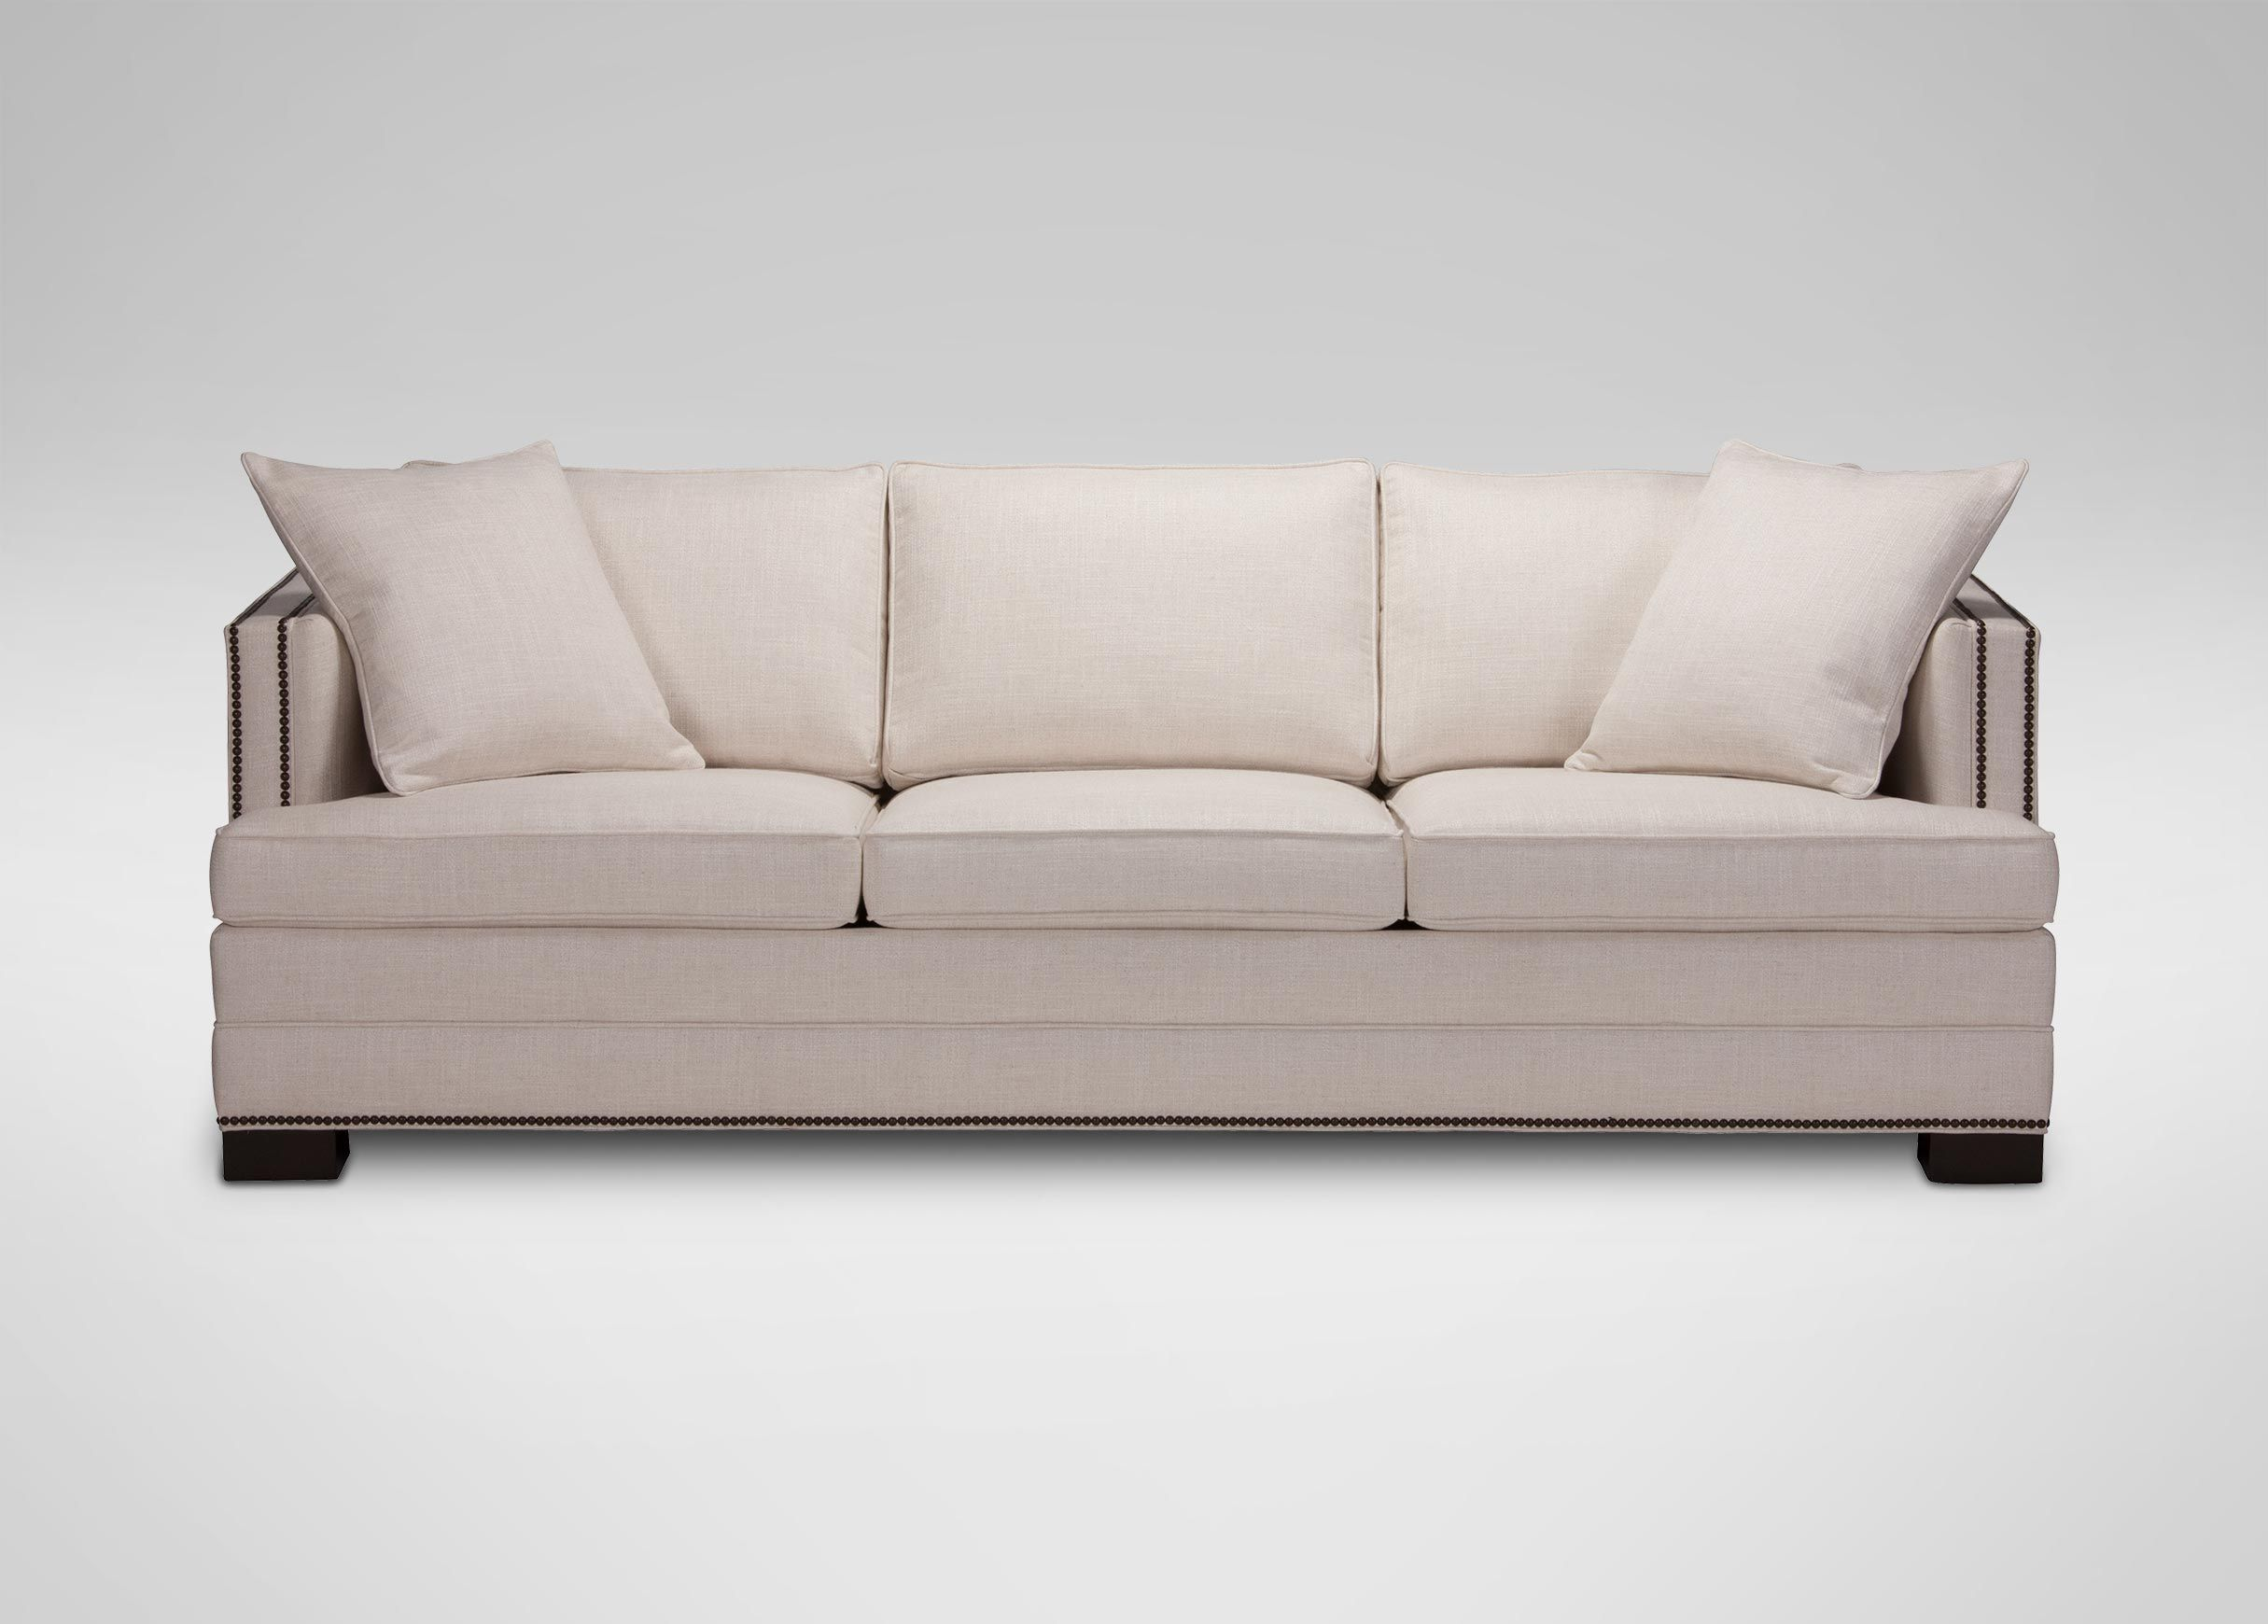 Astor Sofa | Sav Family Room | Sofa, Love seat, Living room sofa